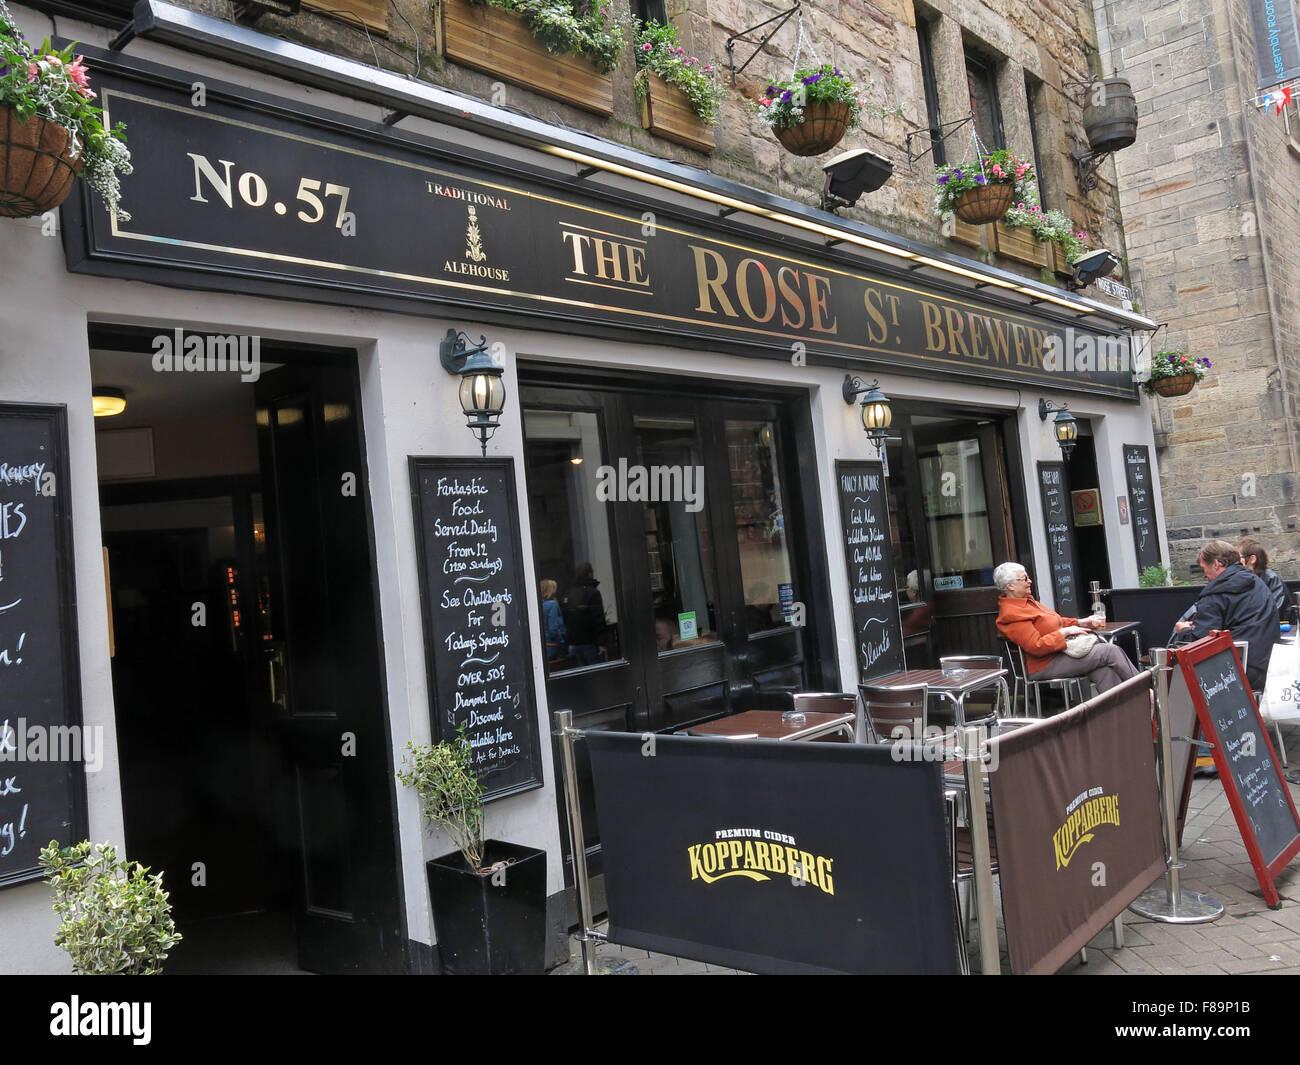 Rose St Brewery No 57,Pub Rose St,Edinburgh City Centre,Scotland,UK - Stock Image